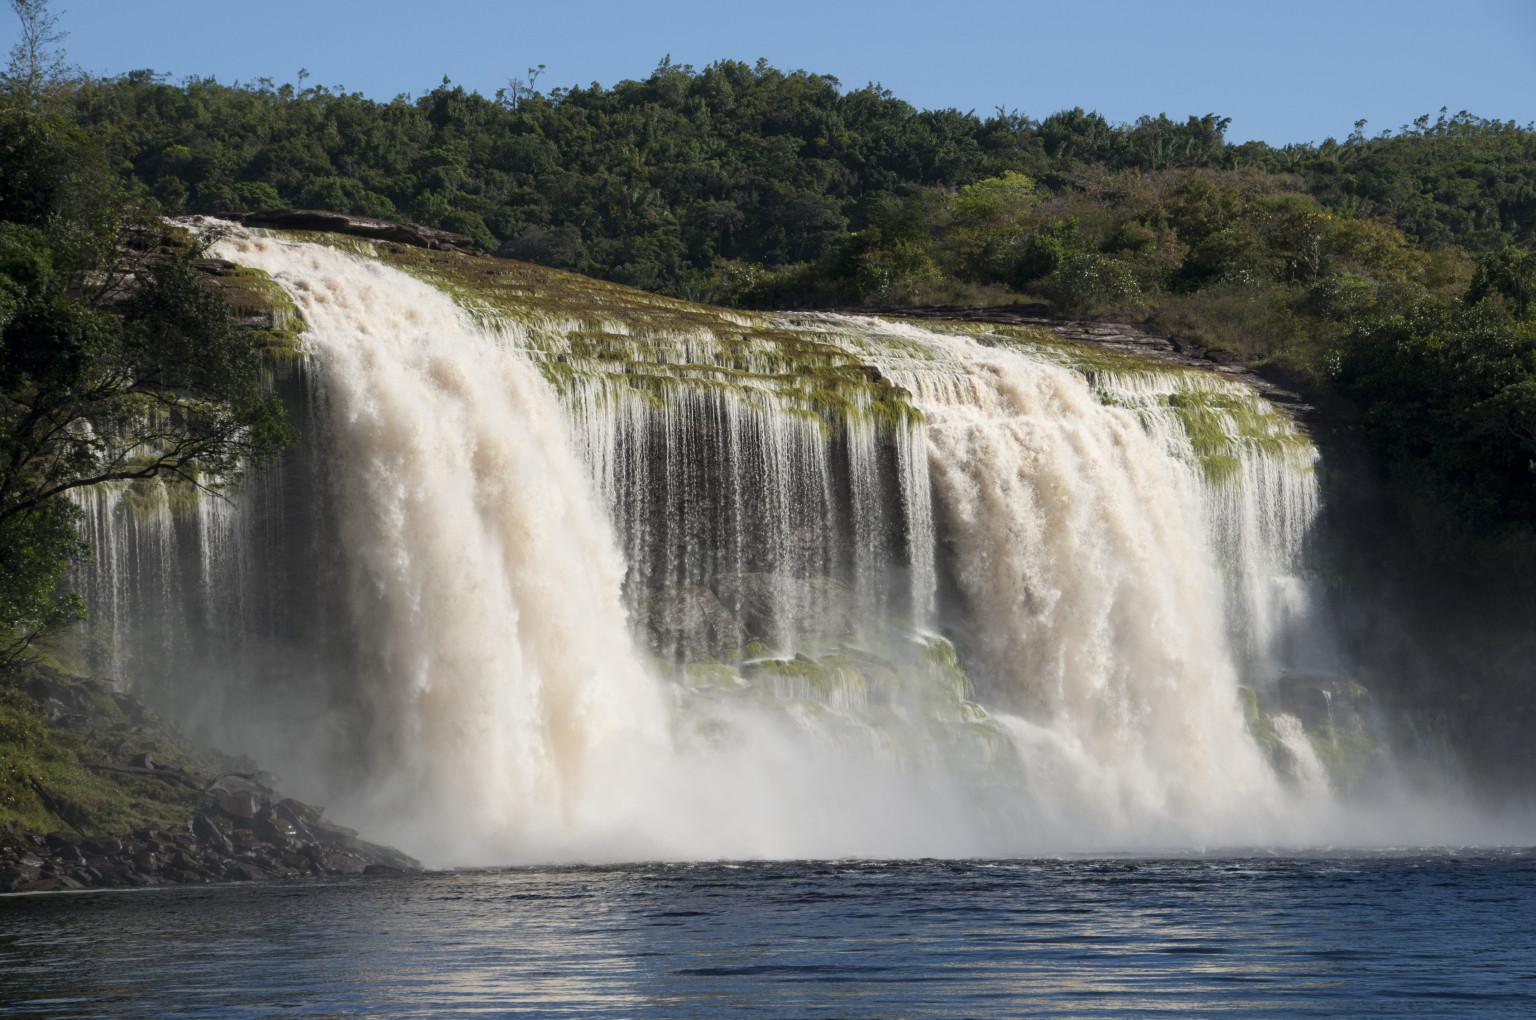 Free Desktop Wallpaper Niagara Falls Venezuela Wallpapers High Quality Download Free